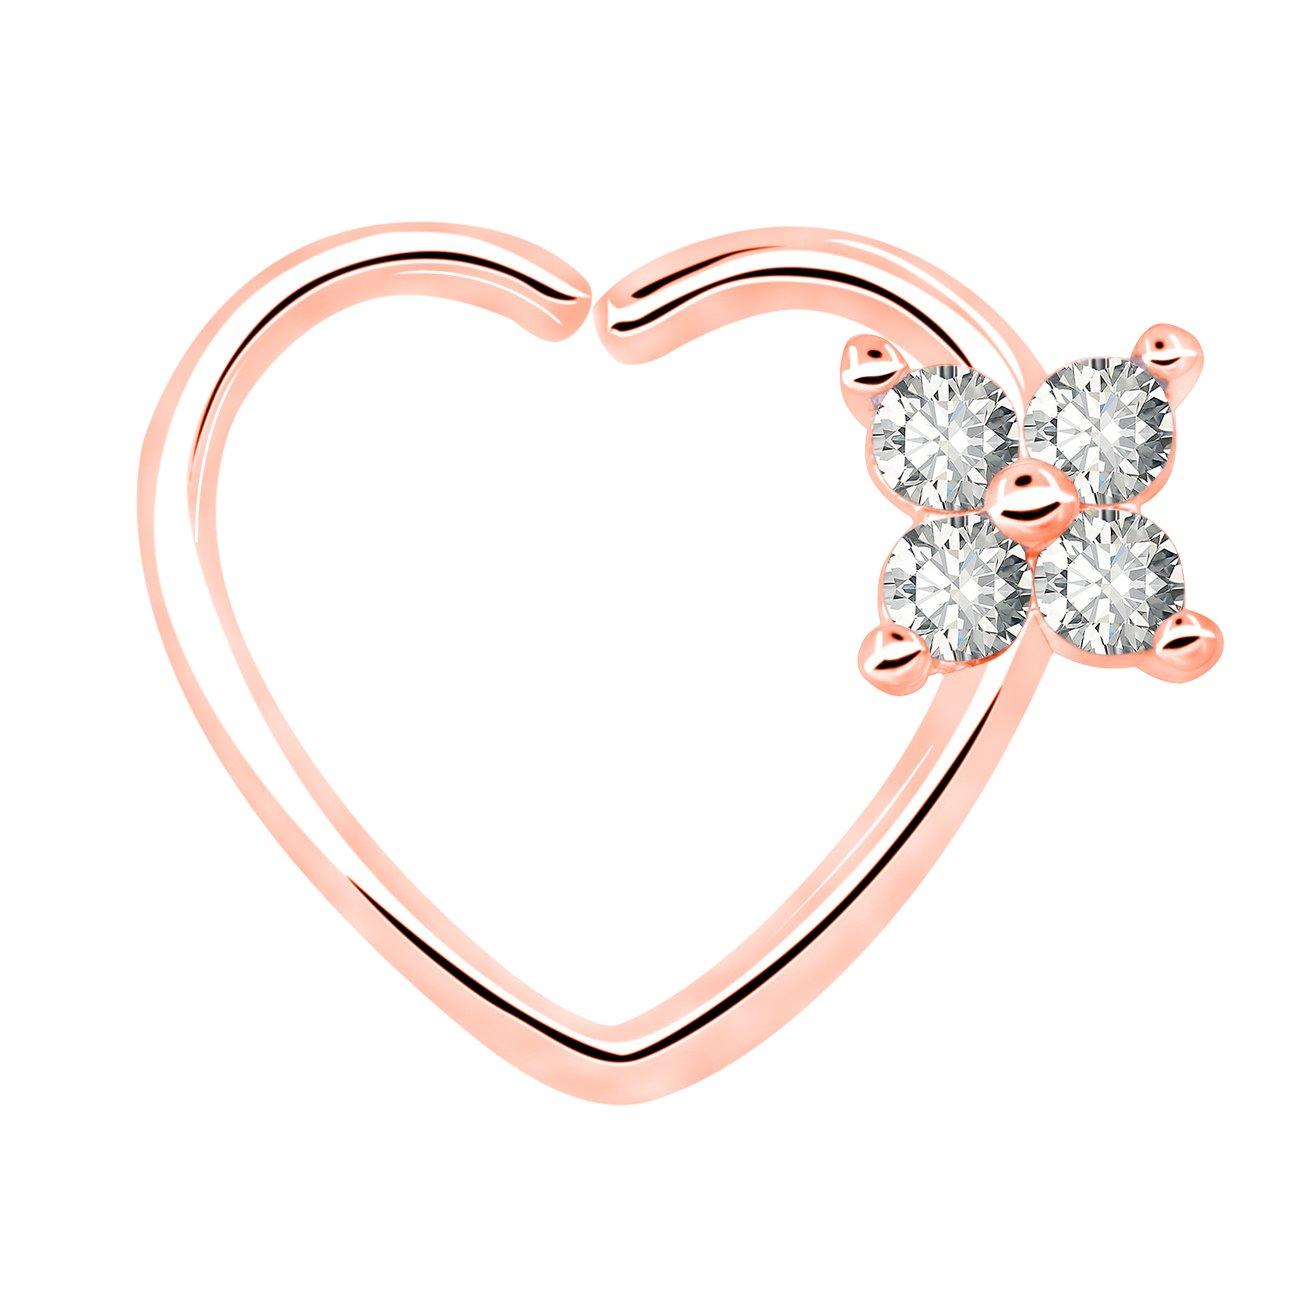 OUFER 16Gauge Flower CZ Heart Left Closure Daith Cartilage Tragus Earrings Body Piercing Jewelry HCA003-4